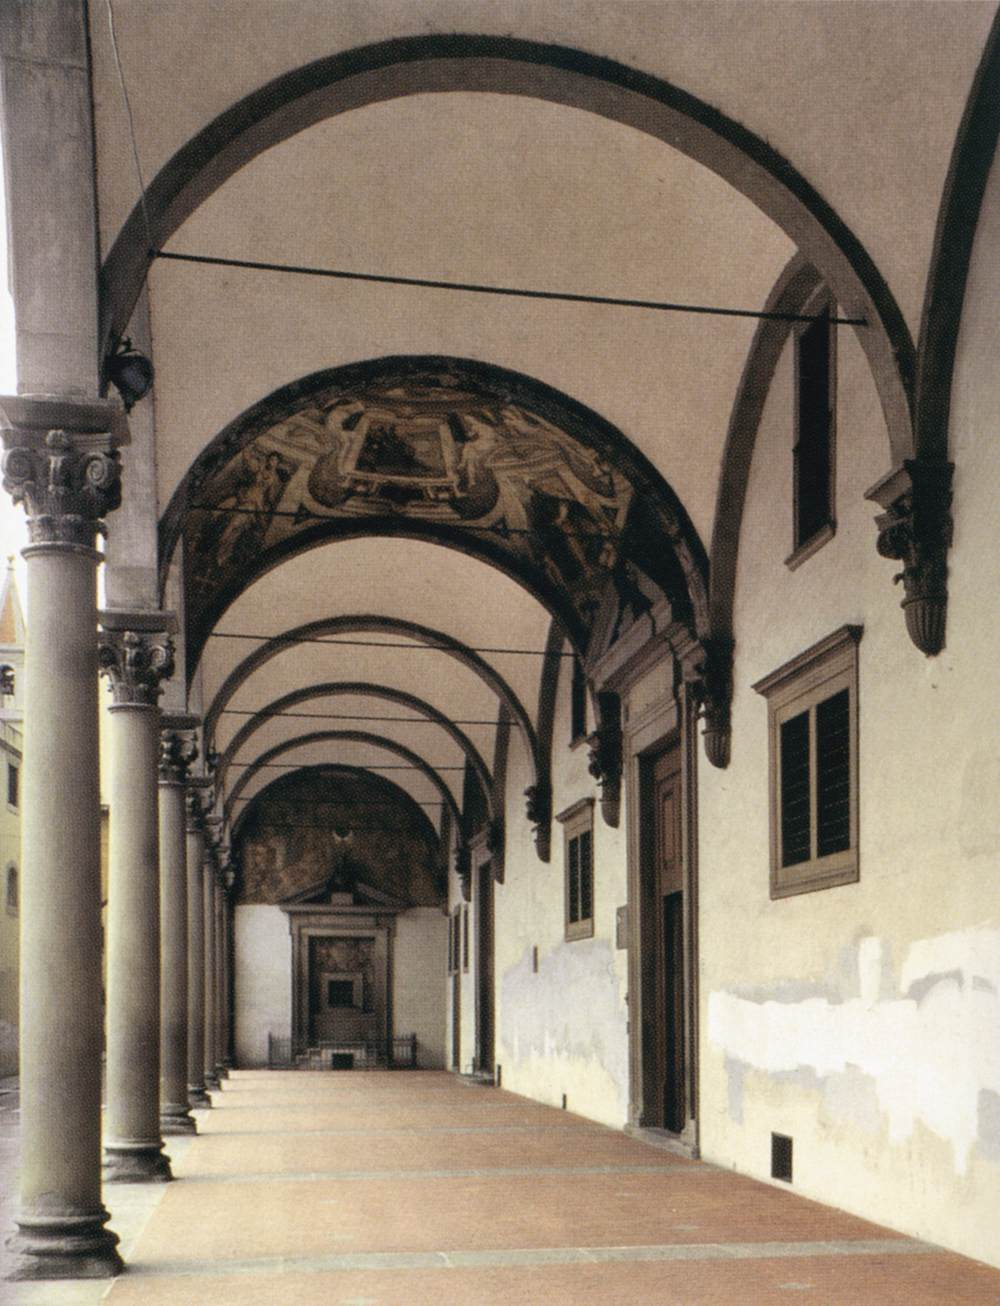 brunelleschi-ospedale_degli_innocenti-facade.jpg